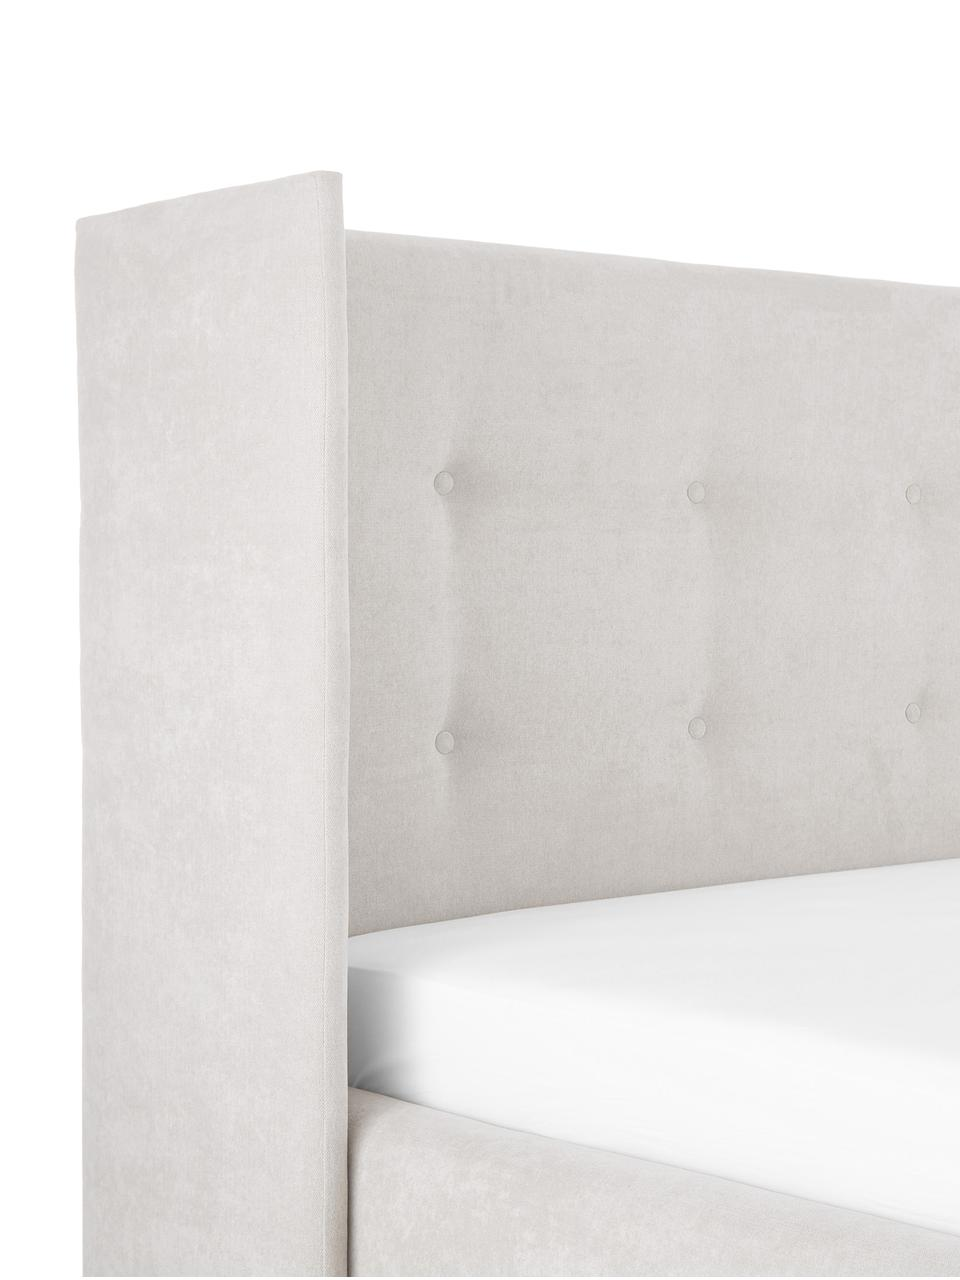 Polsterbett Star, Korpus: Massives Kiefernholz und , Bezug: Polyester (Strukturstoff), Webstoff Beige, 180 x 200 cm